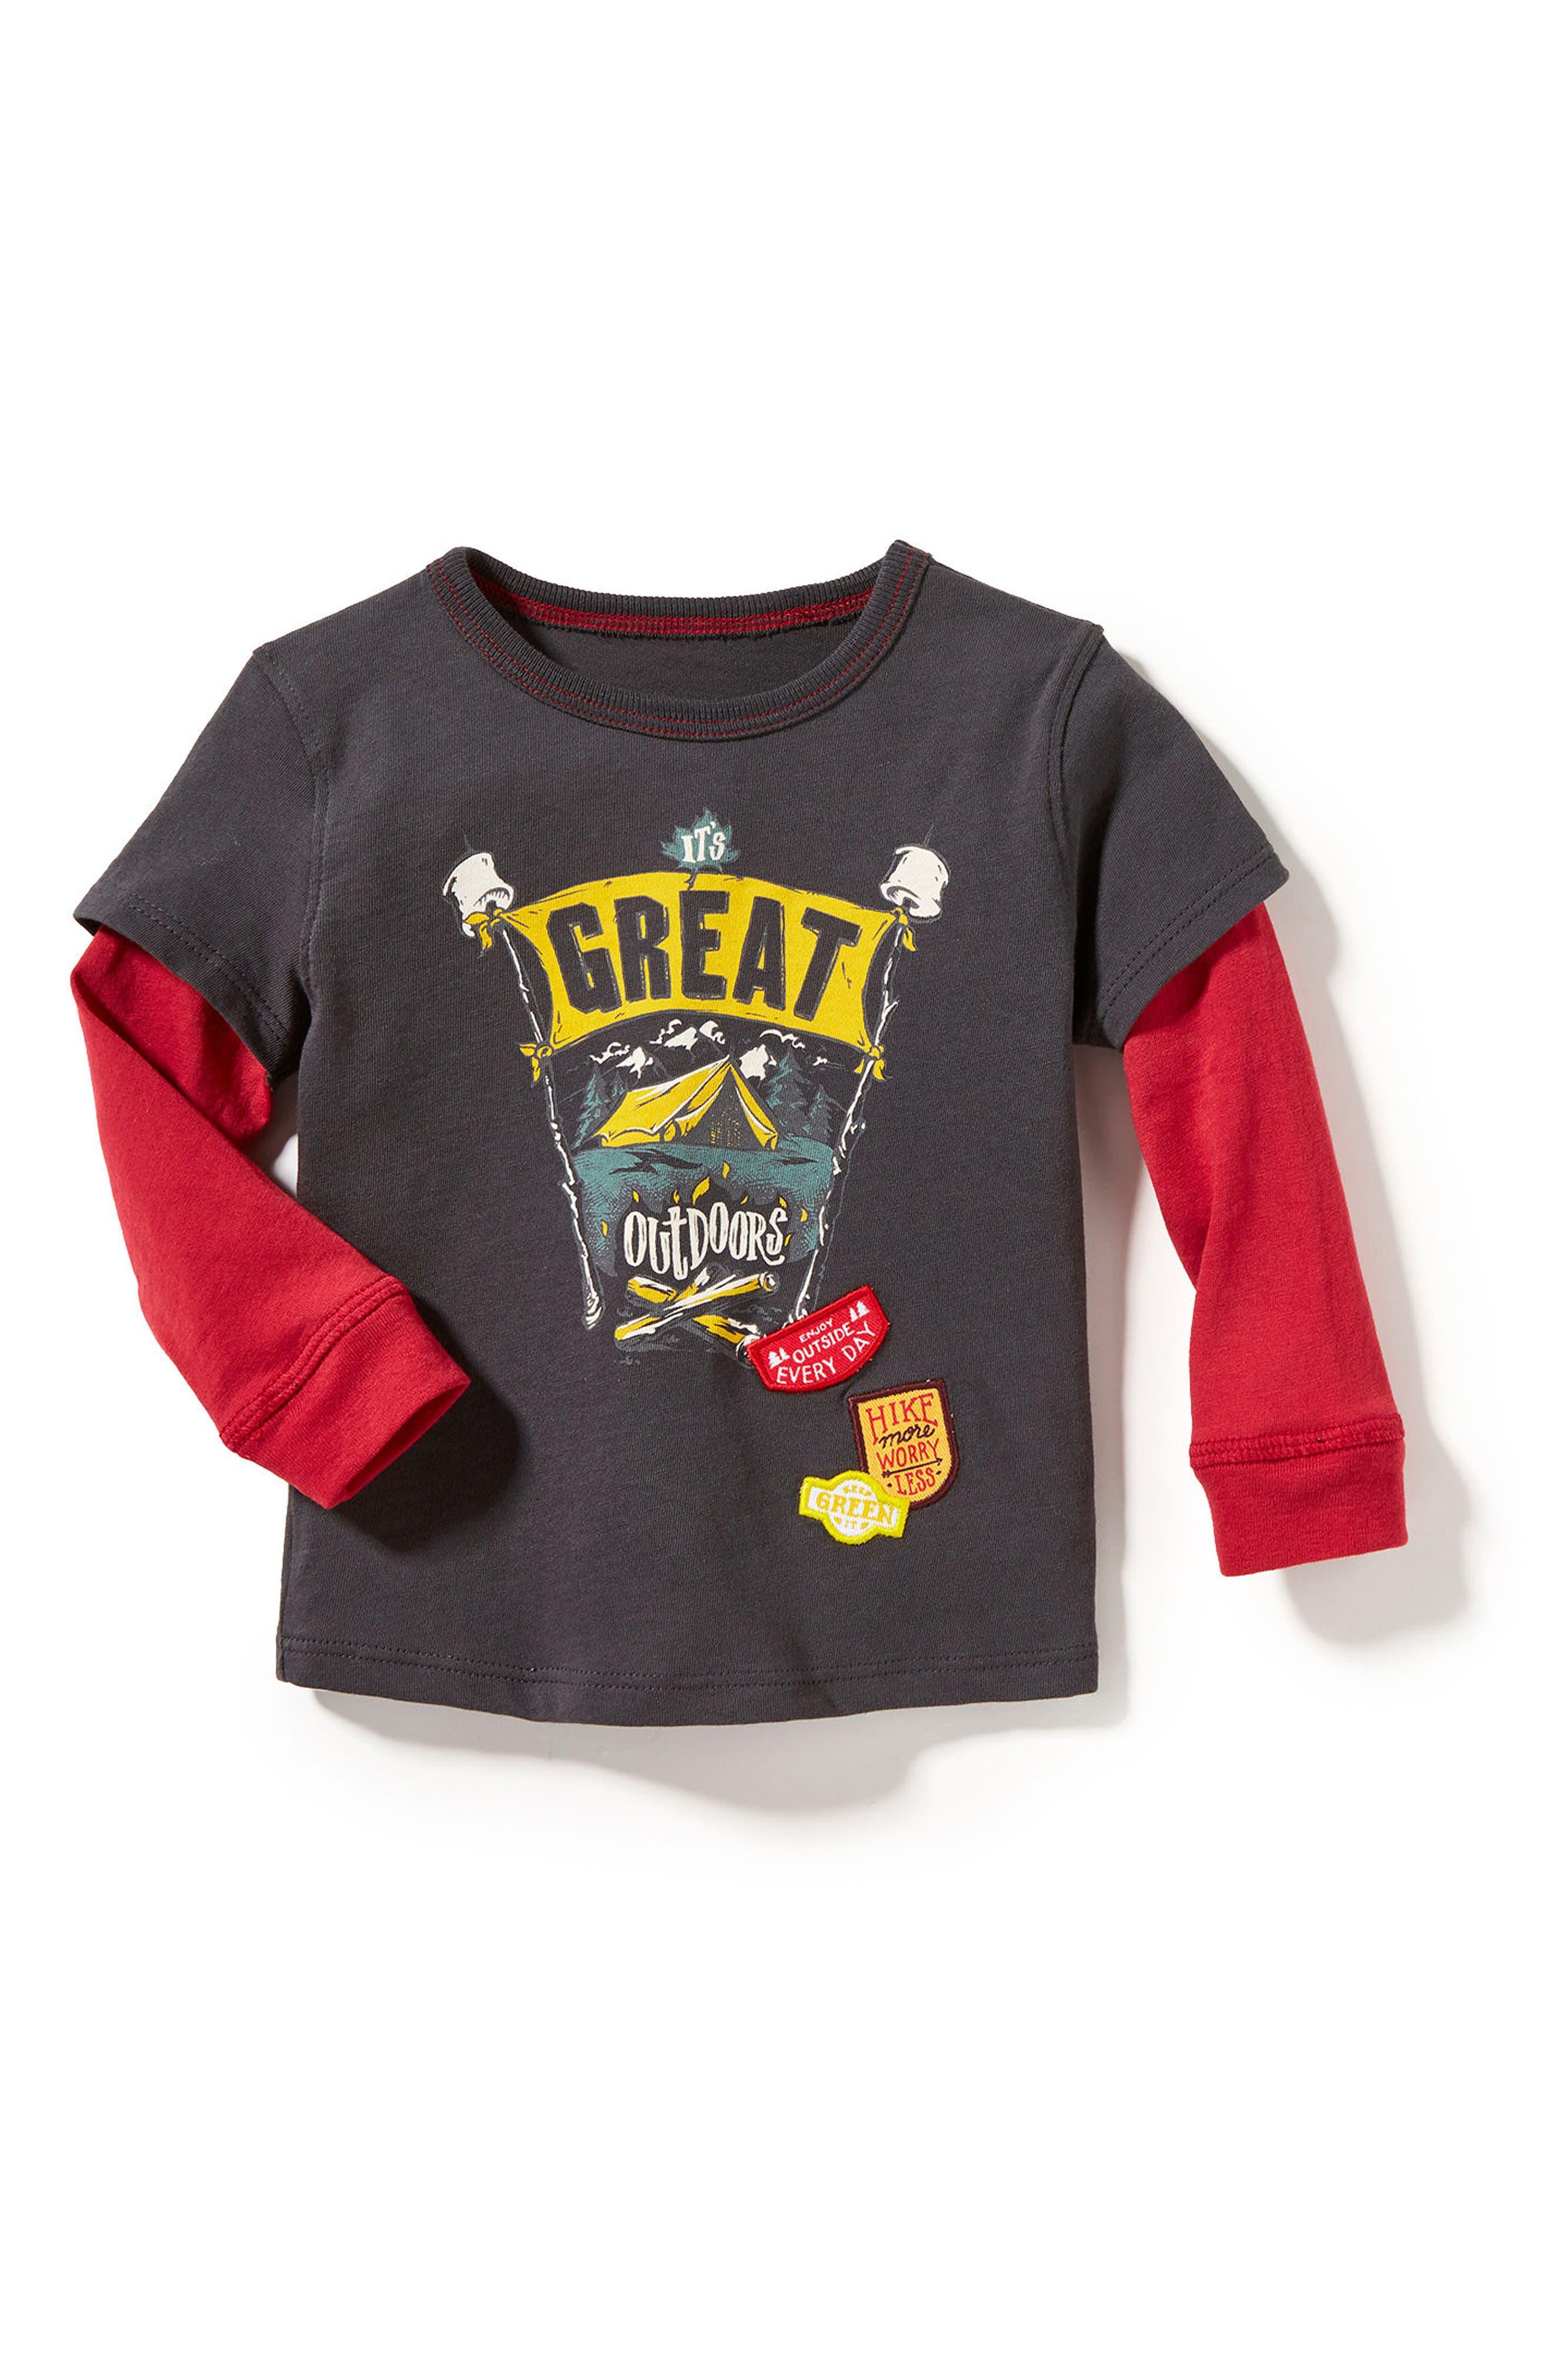 Great Outdoors T-Shirt,                         Main,                         color, Light Heather Grey